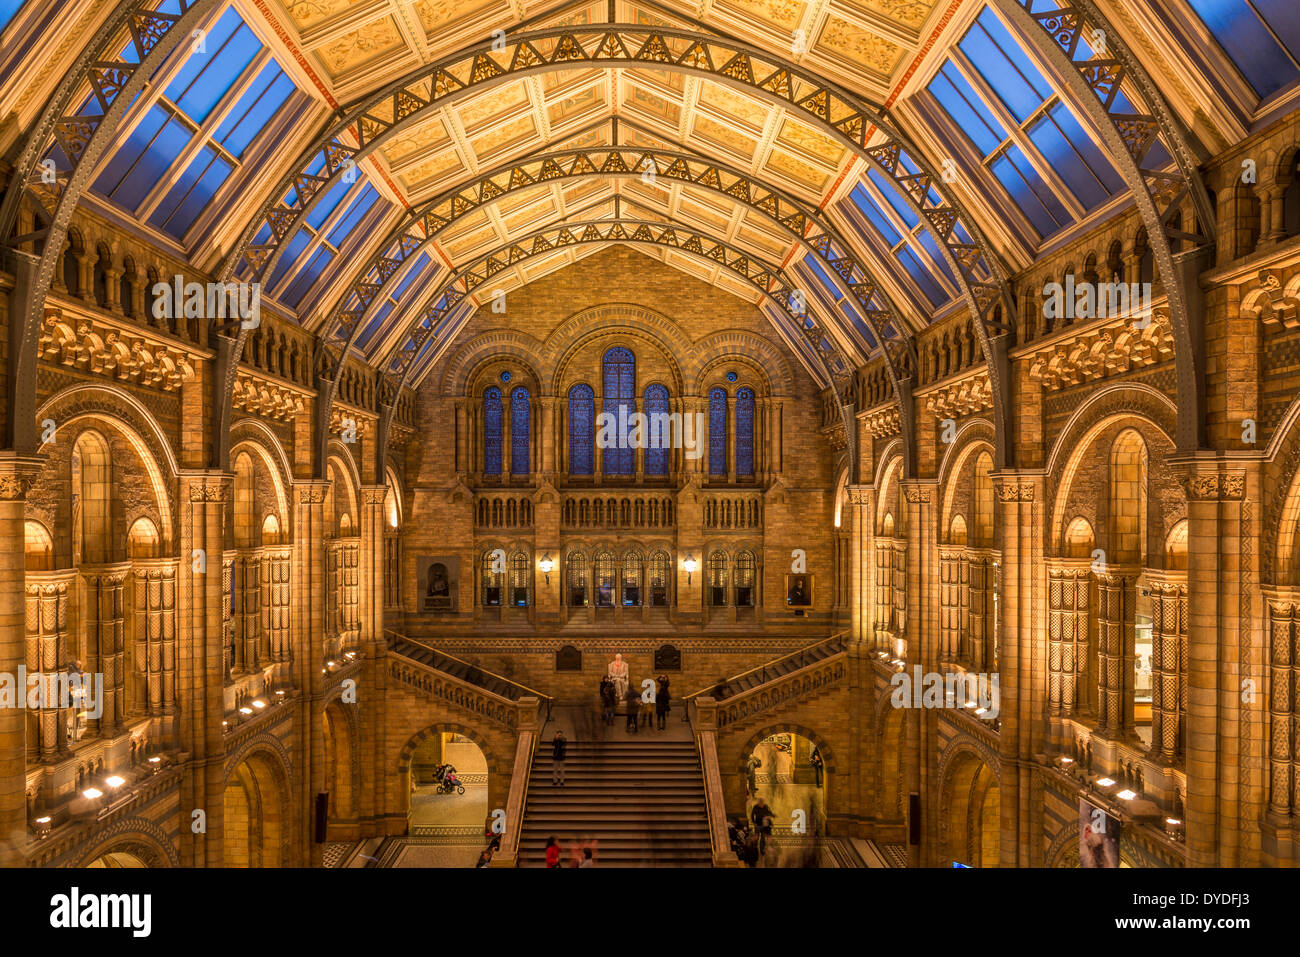 Der Central Hall im Natural History Museum in London. Stockbild